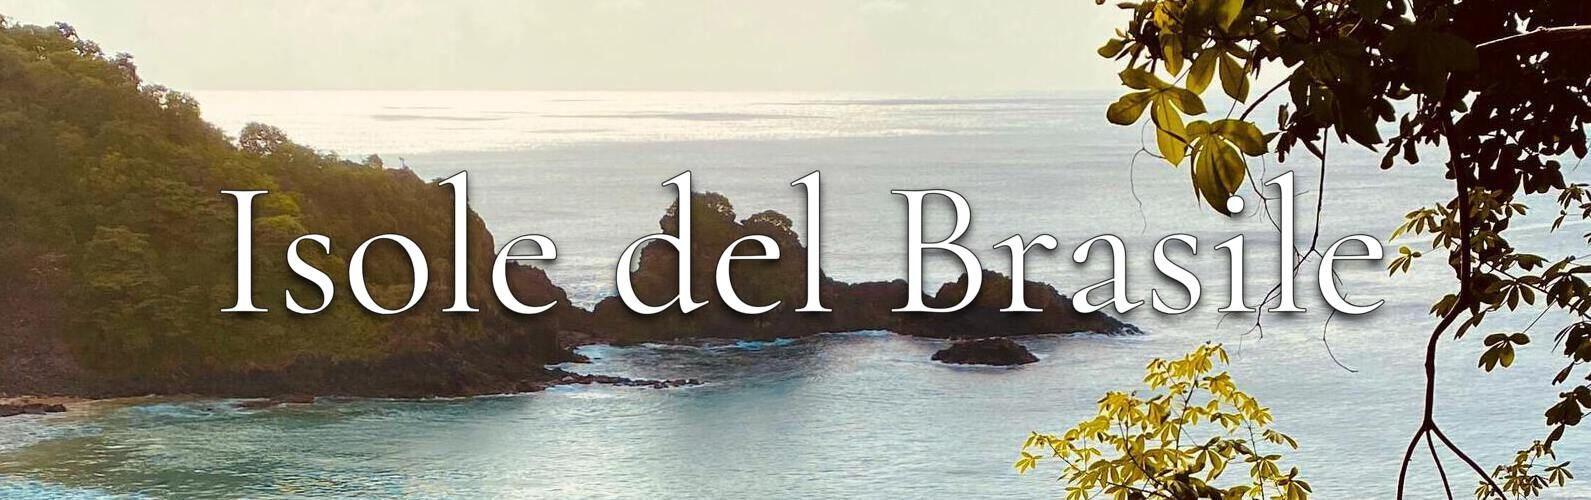 Isole Brasile